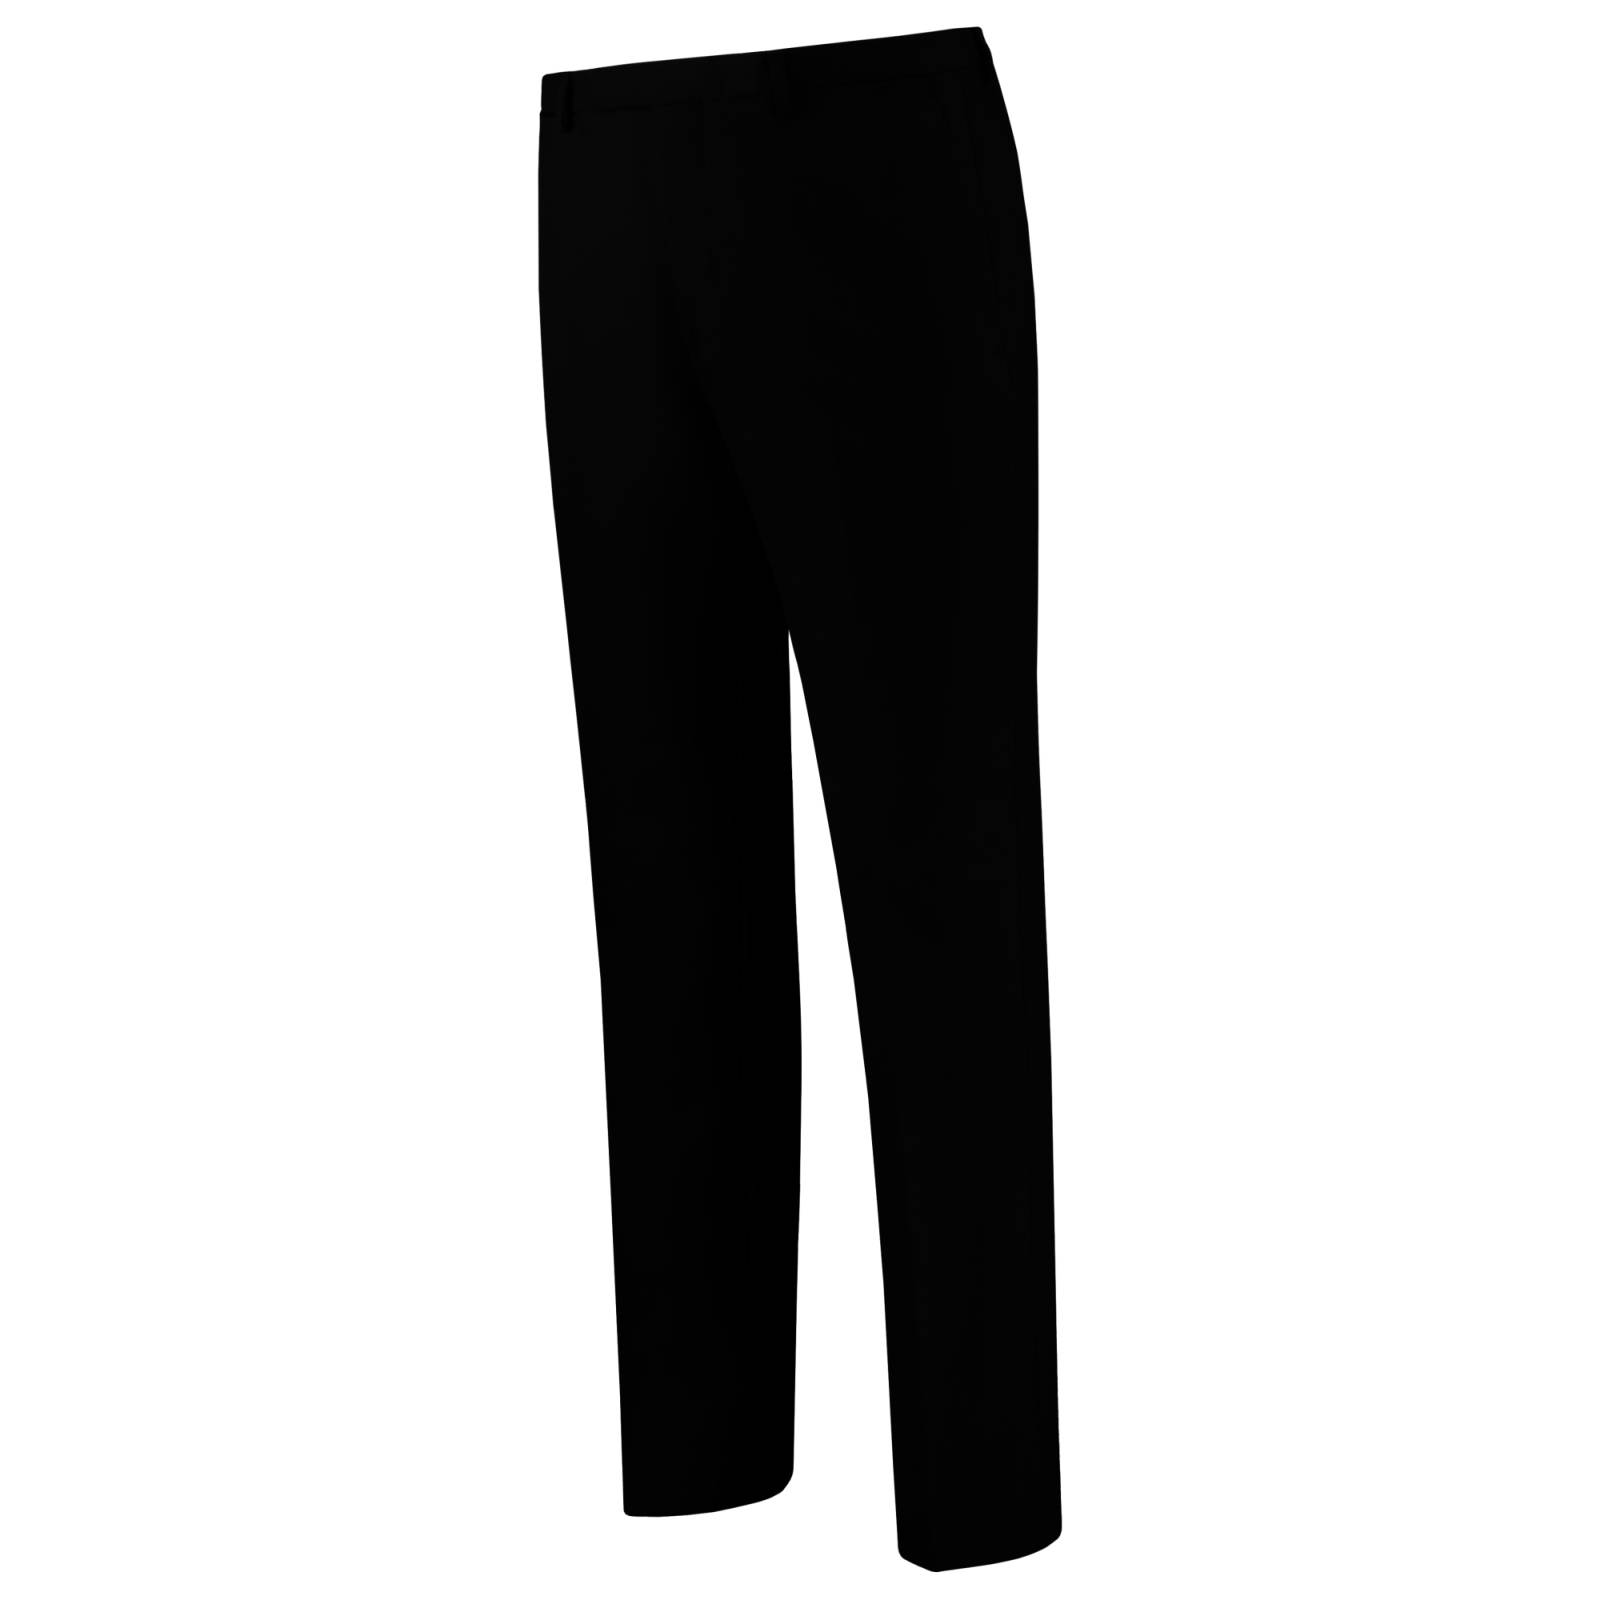 Tricorp Corporate Broeken 505003-CMT6000 Stretch zwart(Black)